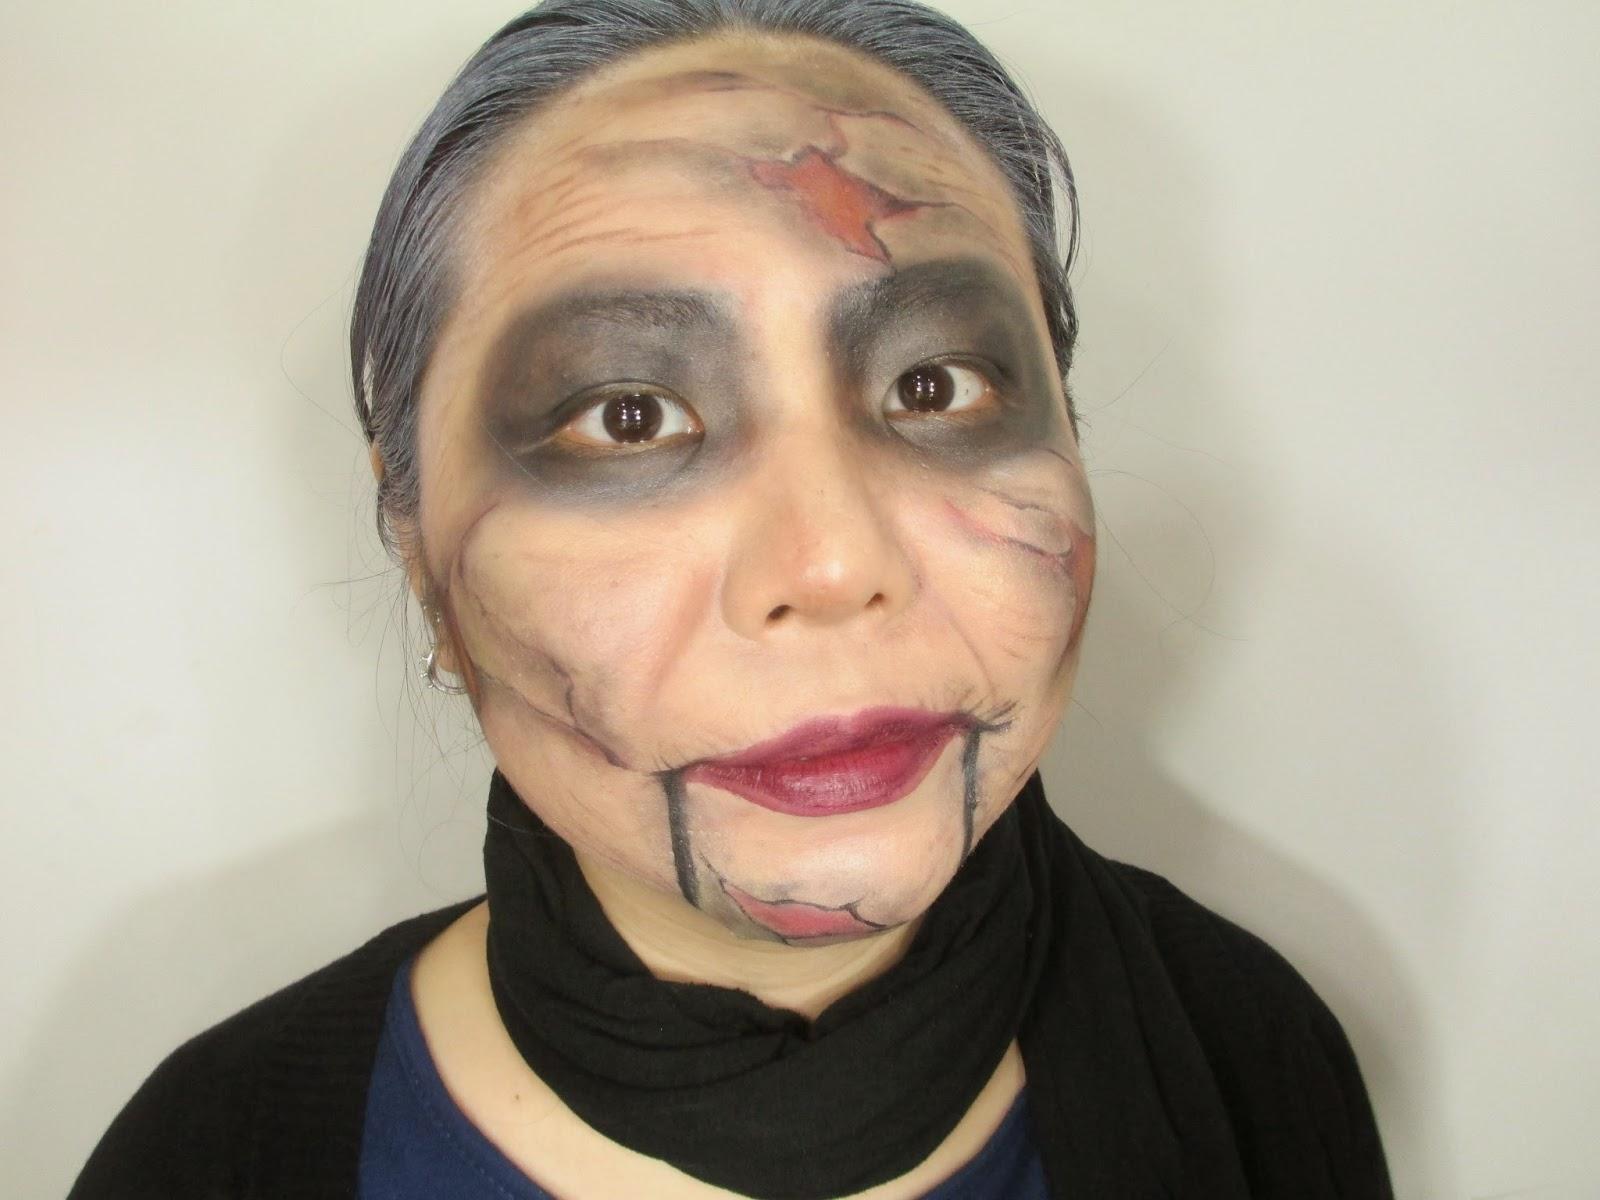 Mary shaw makeup tutorial face painting character makeup mary shaw makeup tutorial face painting character makeup baditri Choice Image